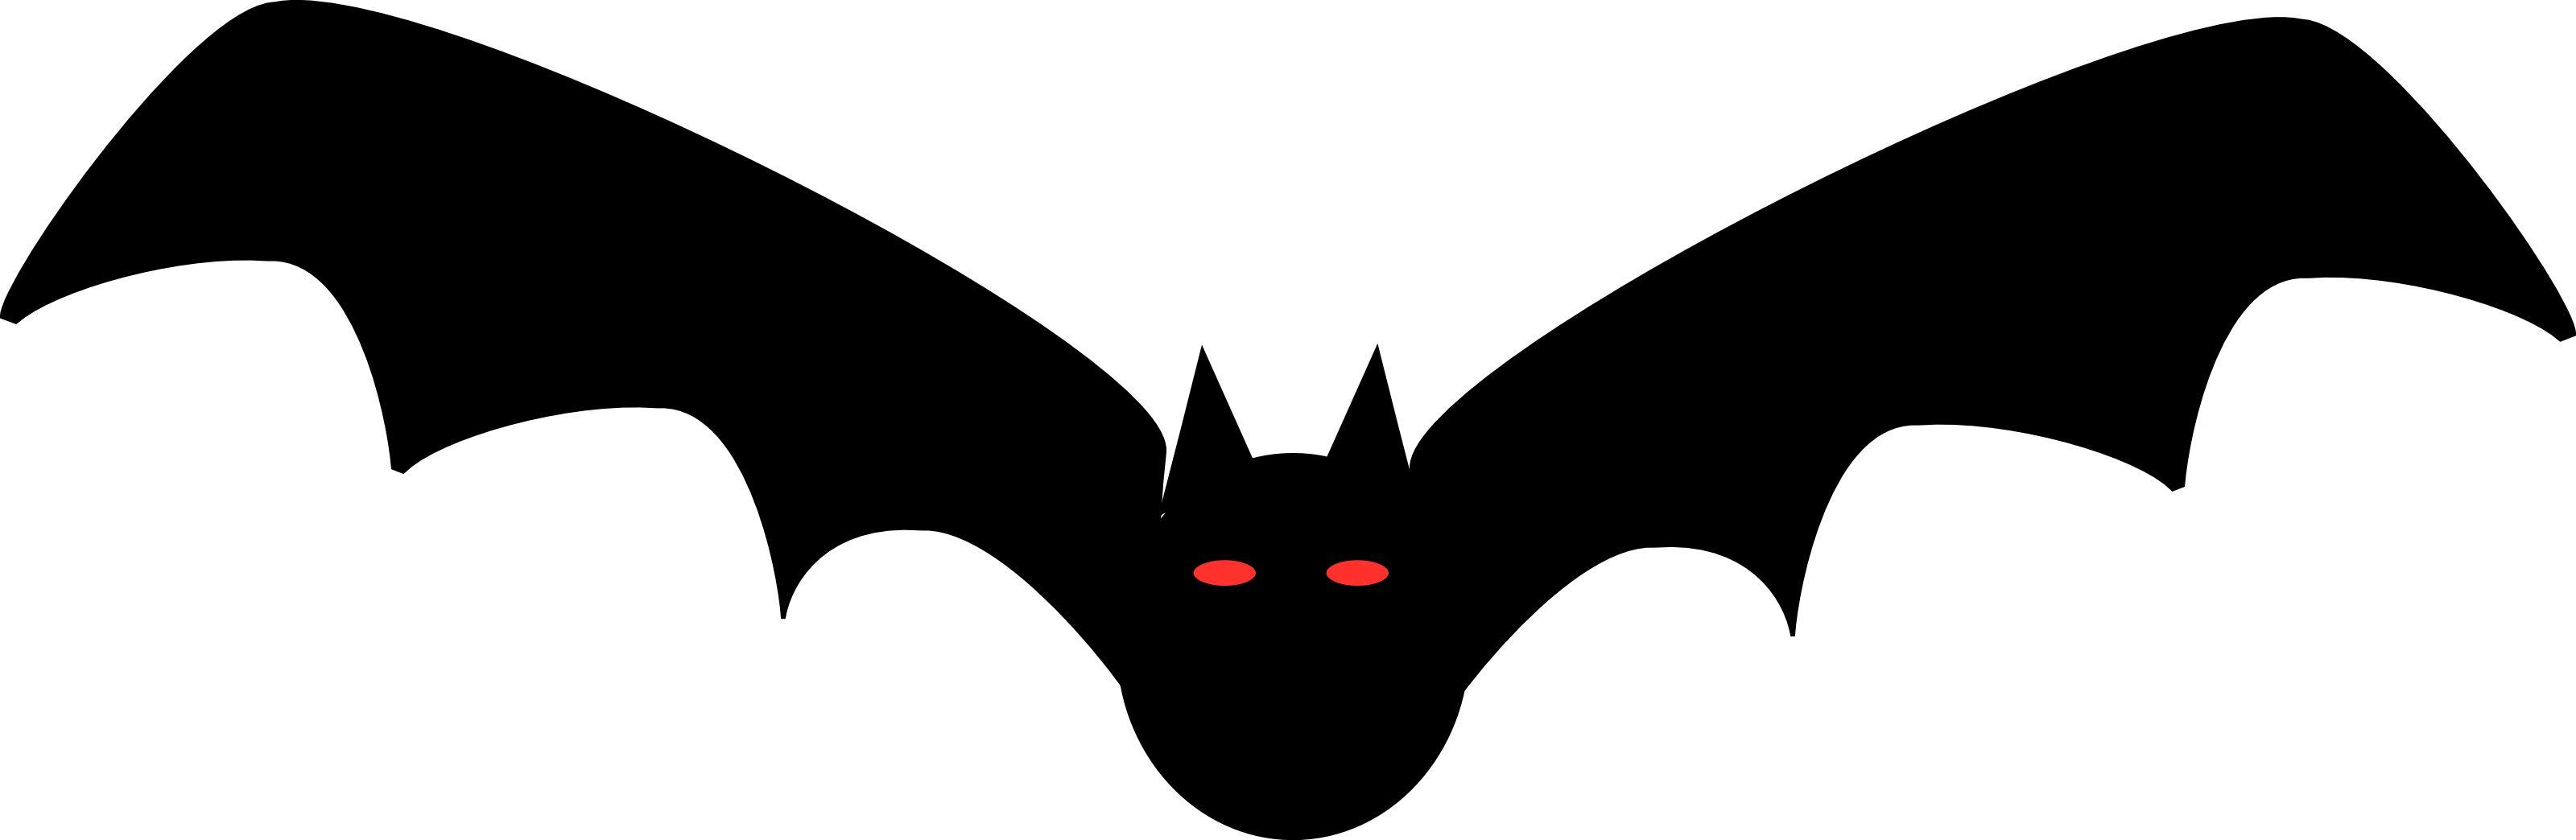 free halloween clipart illustration of black bat with red eyes rh pinterest com Happy Halloween Clip Art Halloween Witch Clip Art